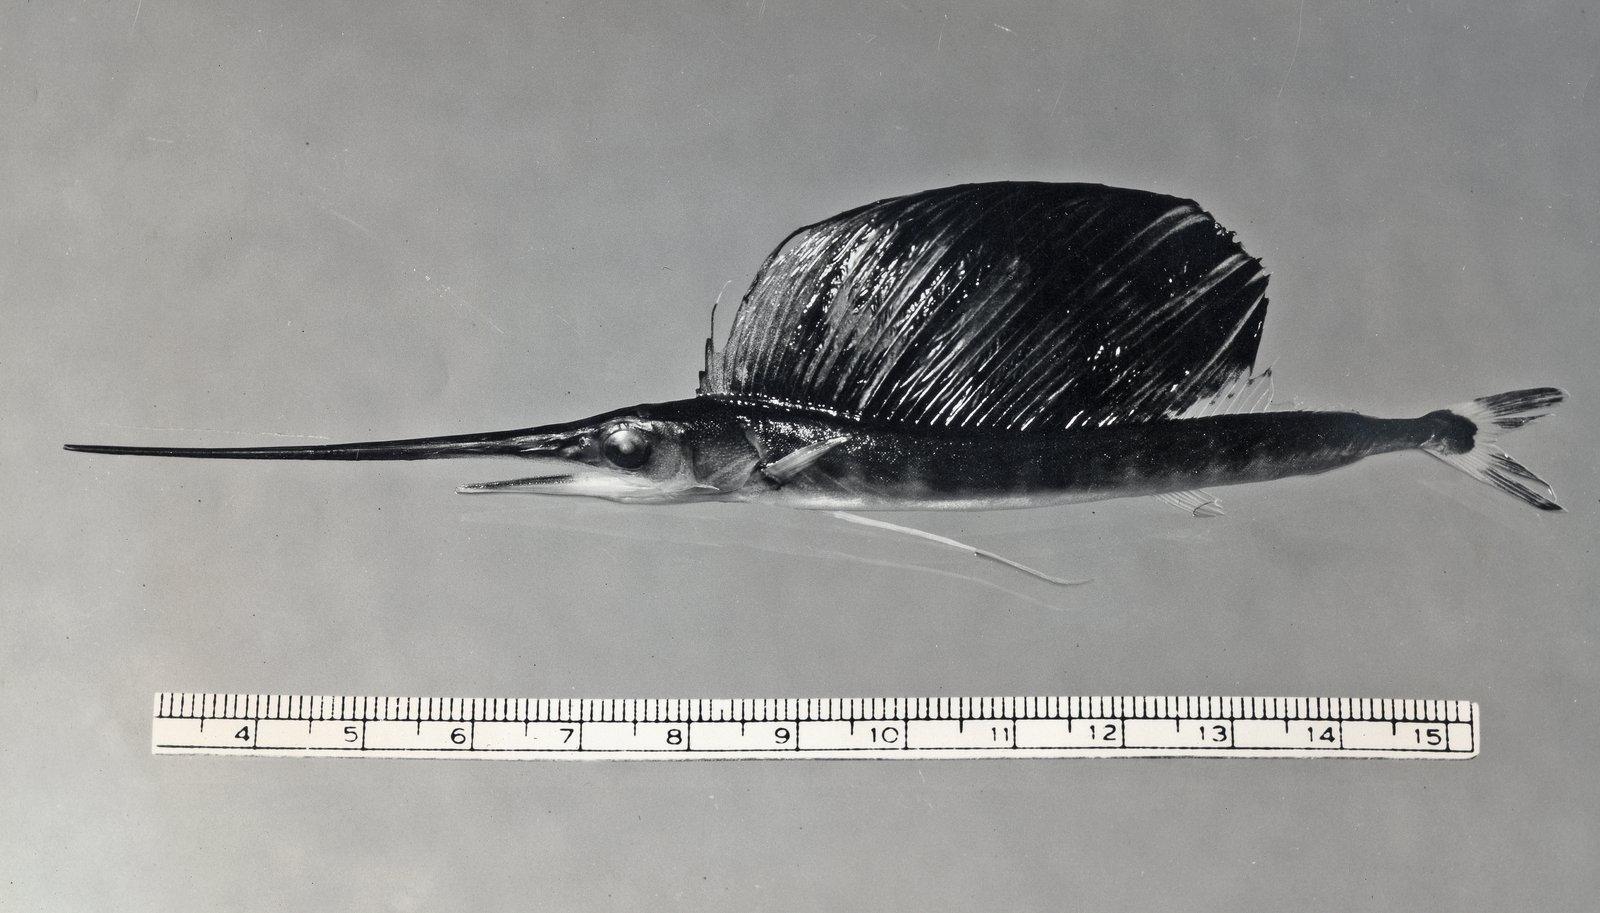 Indo-Pacific Sailfish, Istiophorus platypterus